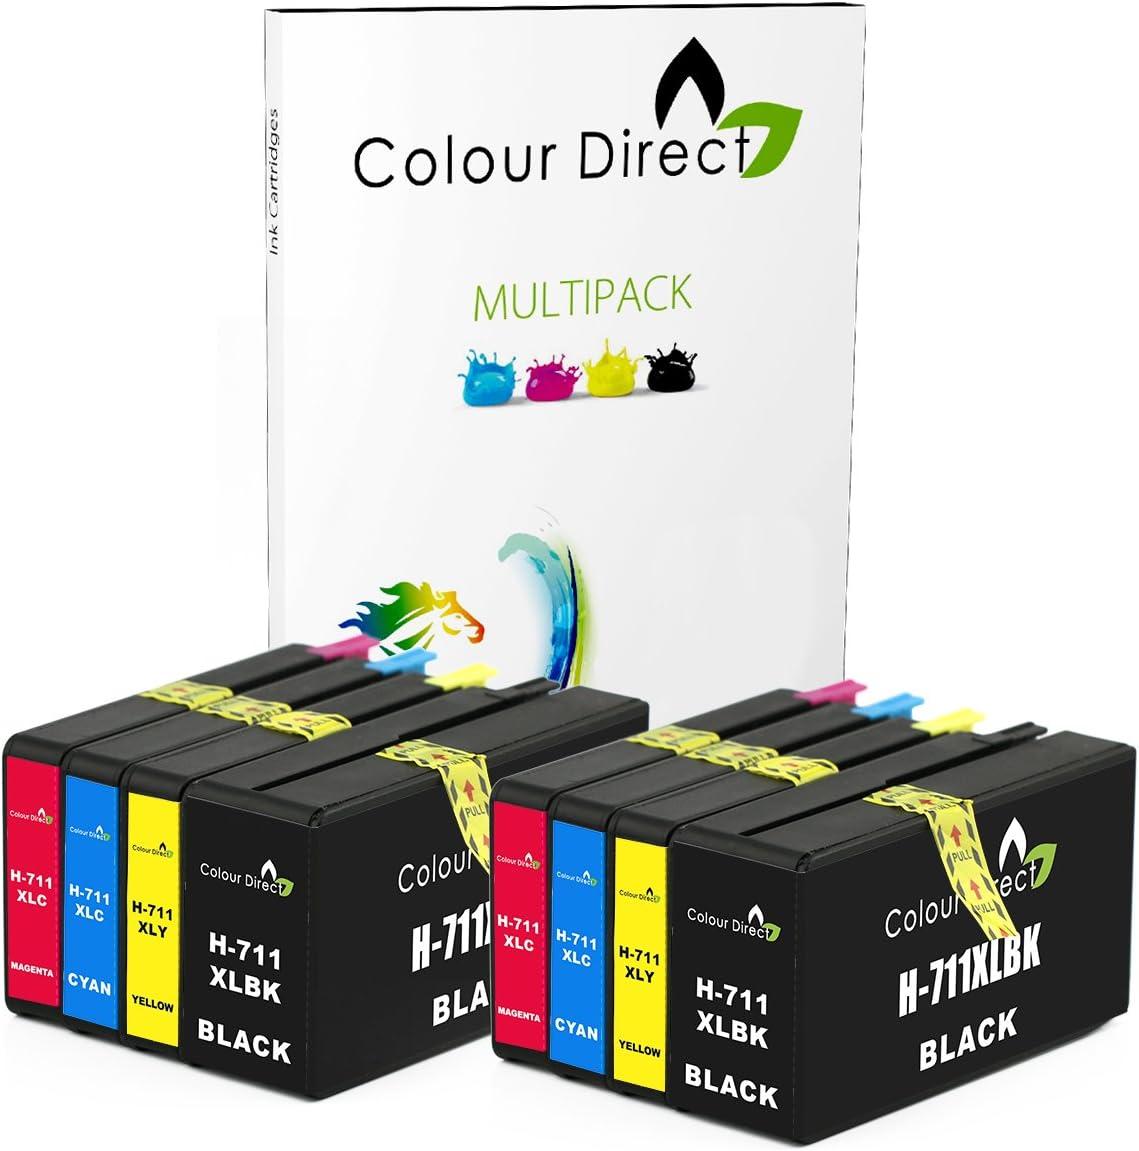 Colour Direct - 5 (1 Conjunto + 1 Negro) Compatible Cartuchos de Tinta Reemplazo por HP 711 Designjet T120, T520 Impresoras (CZ129A, CZ130A, CZ131A, CZ132A): Amazon.es: Electrónica